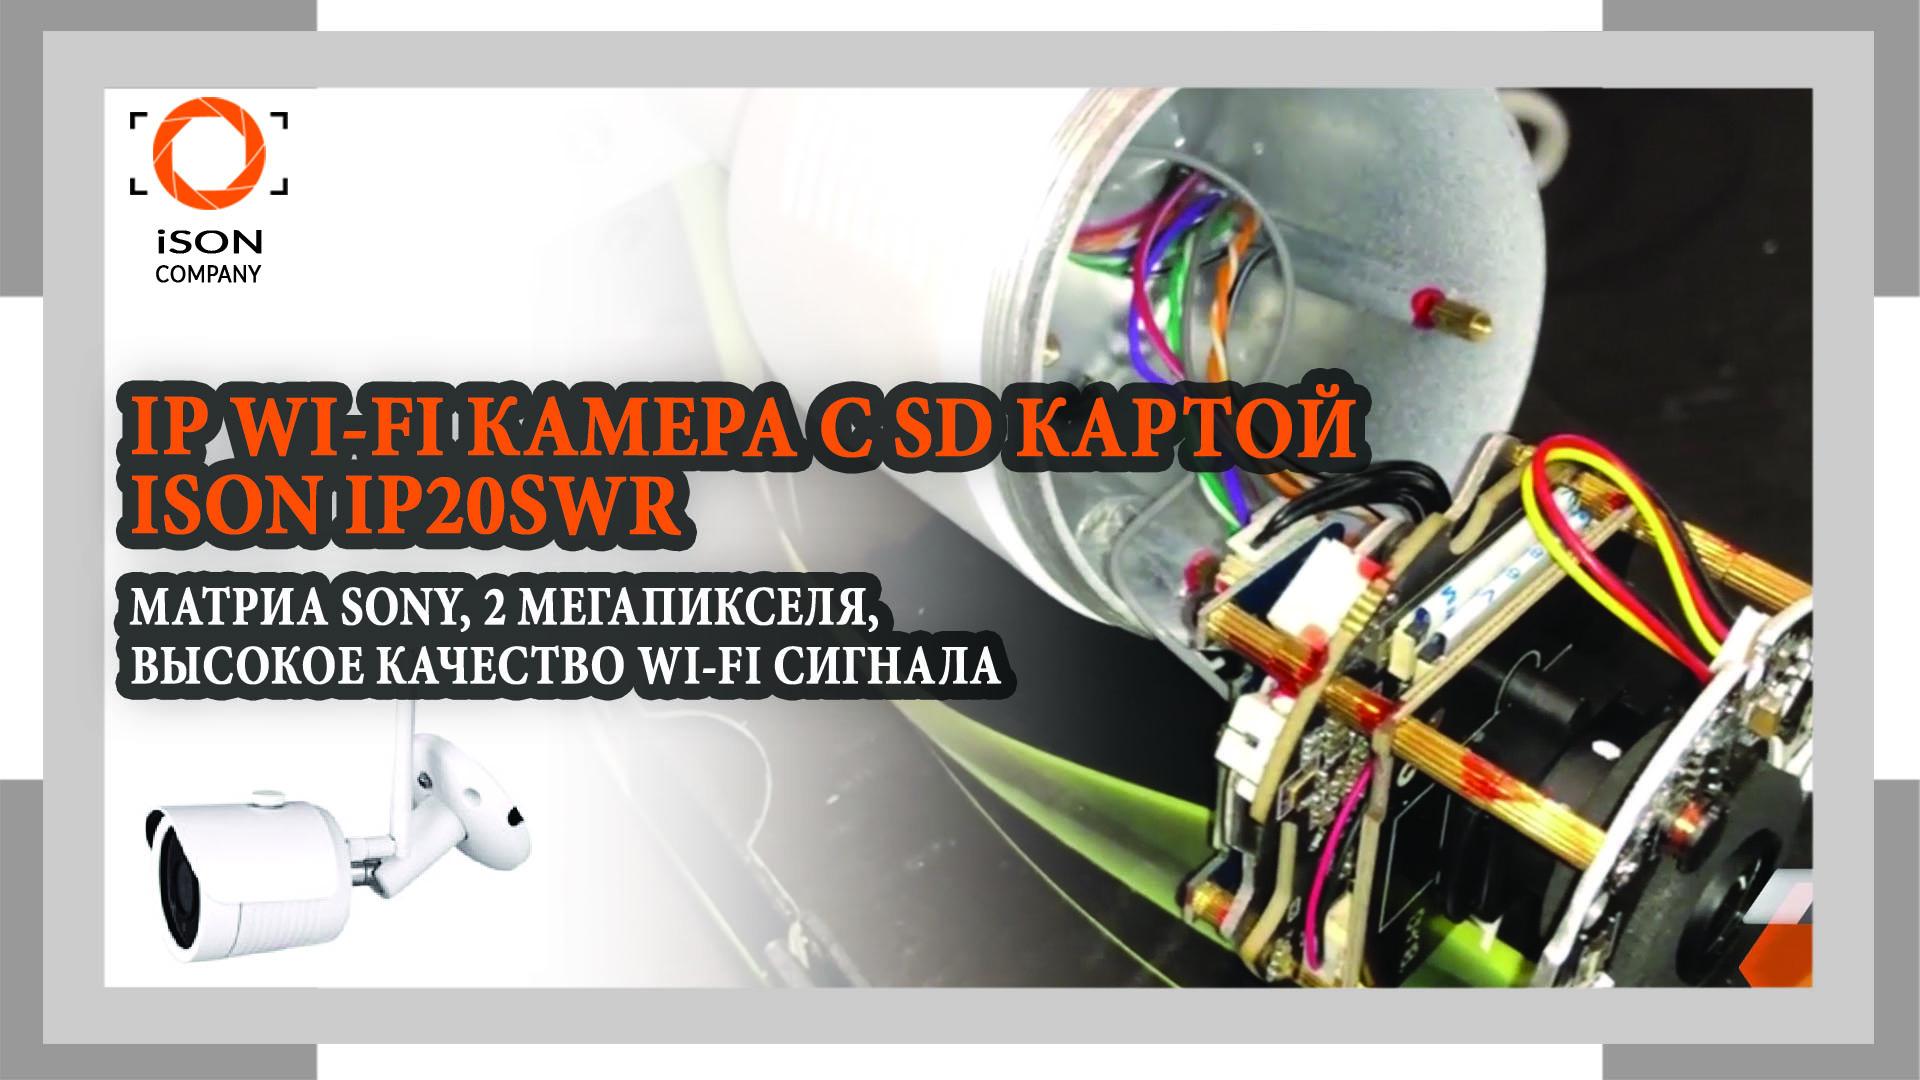 БЕСПРОВОДНАЯ WI FI КАМЕРА С SD КАРТОЙ SONY ISON IP20SWR